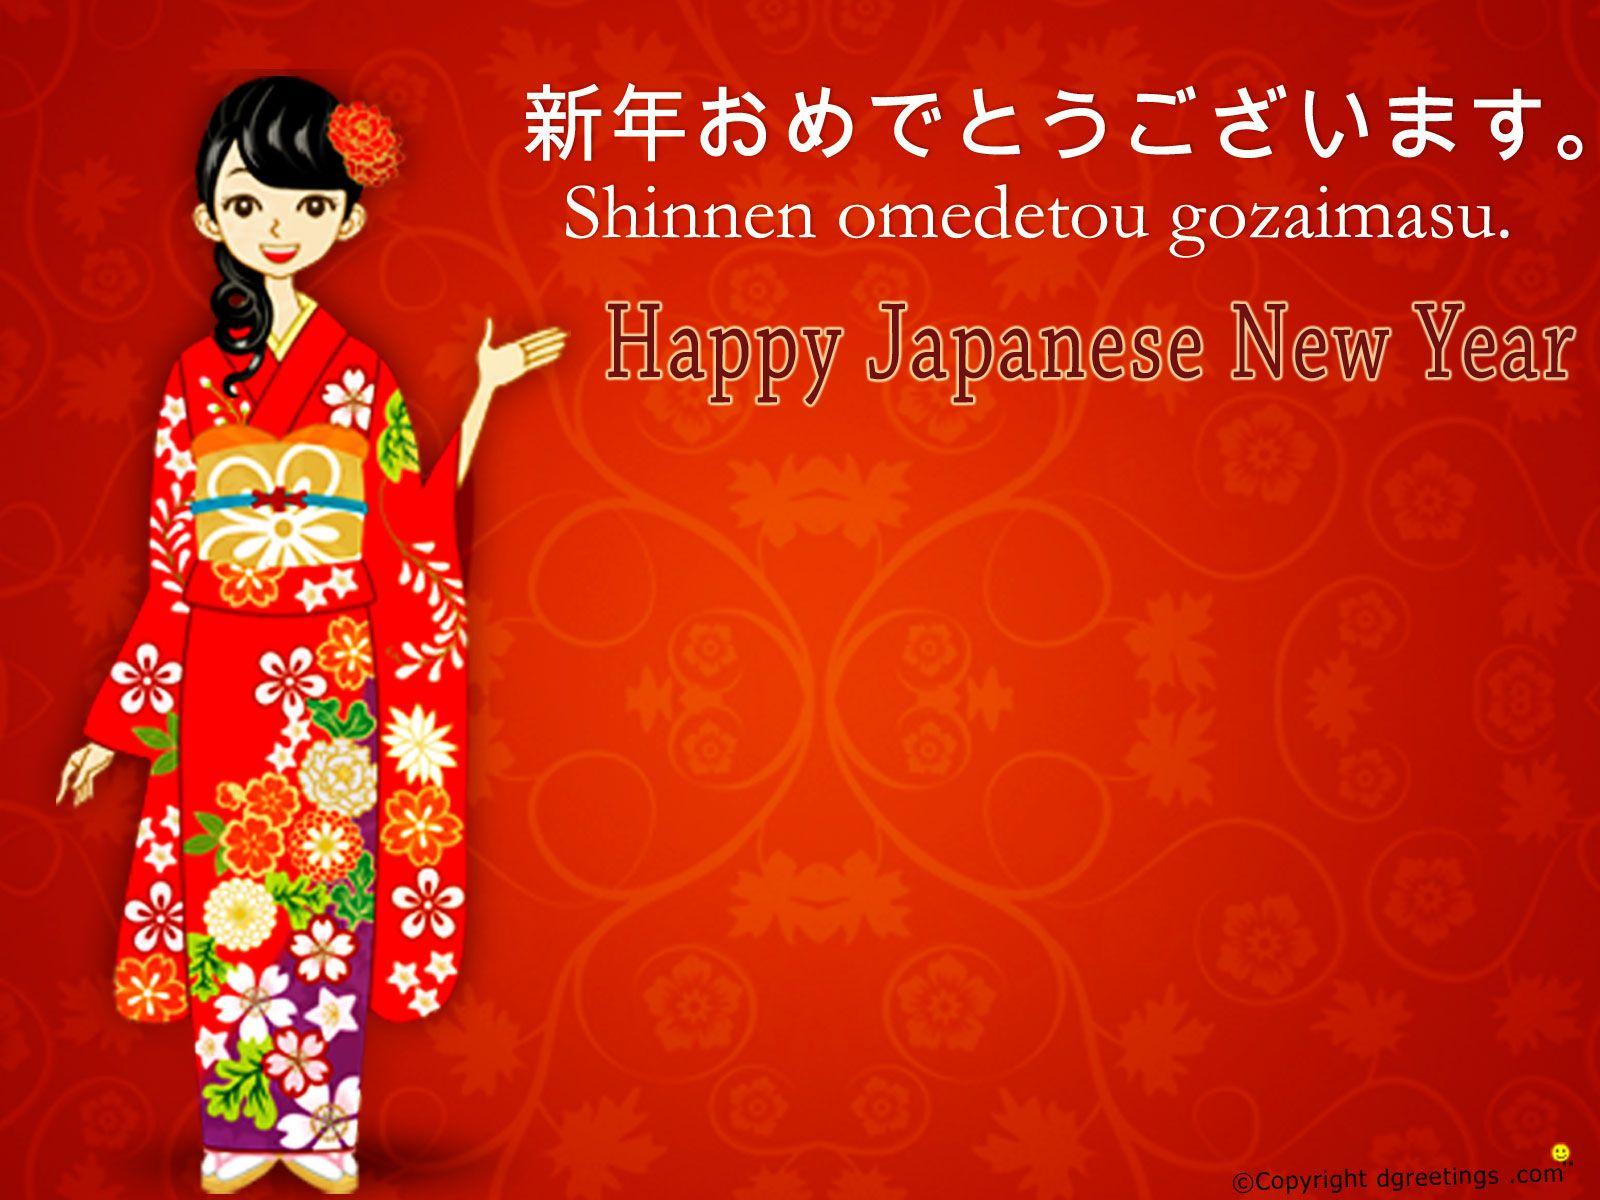 Japanese New Year Wallpaper Happy Japanese New Year